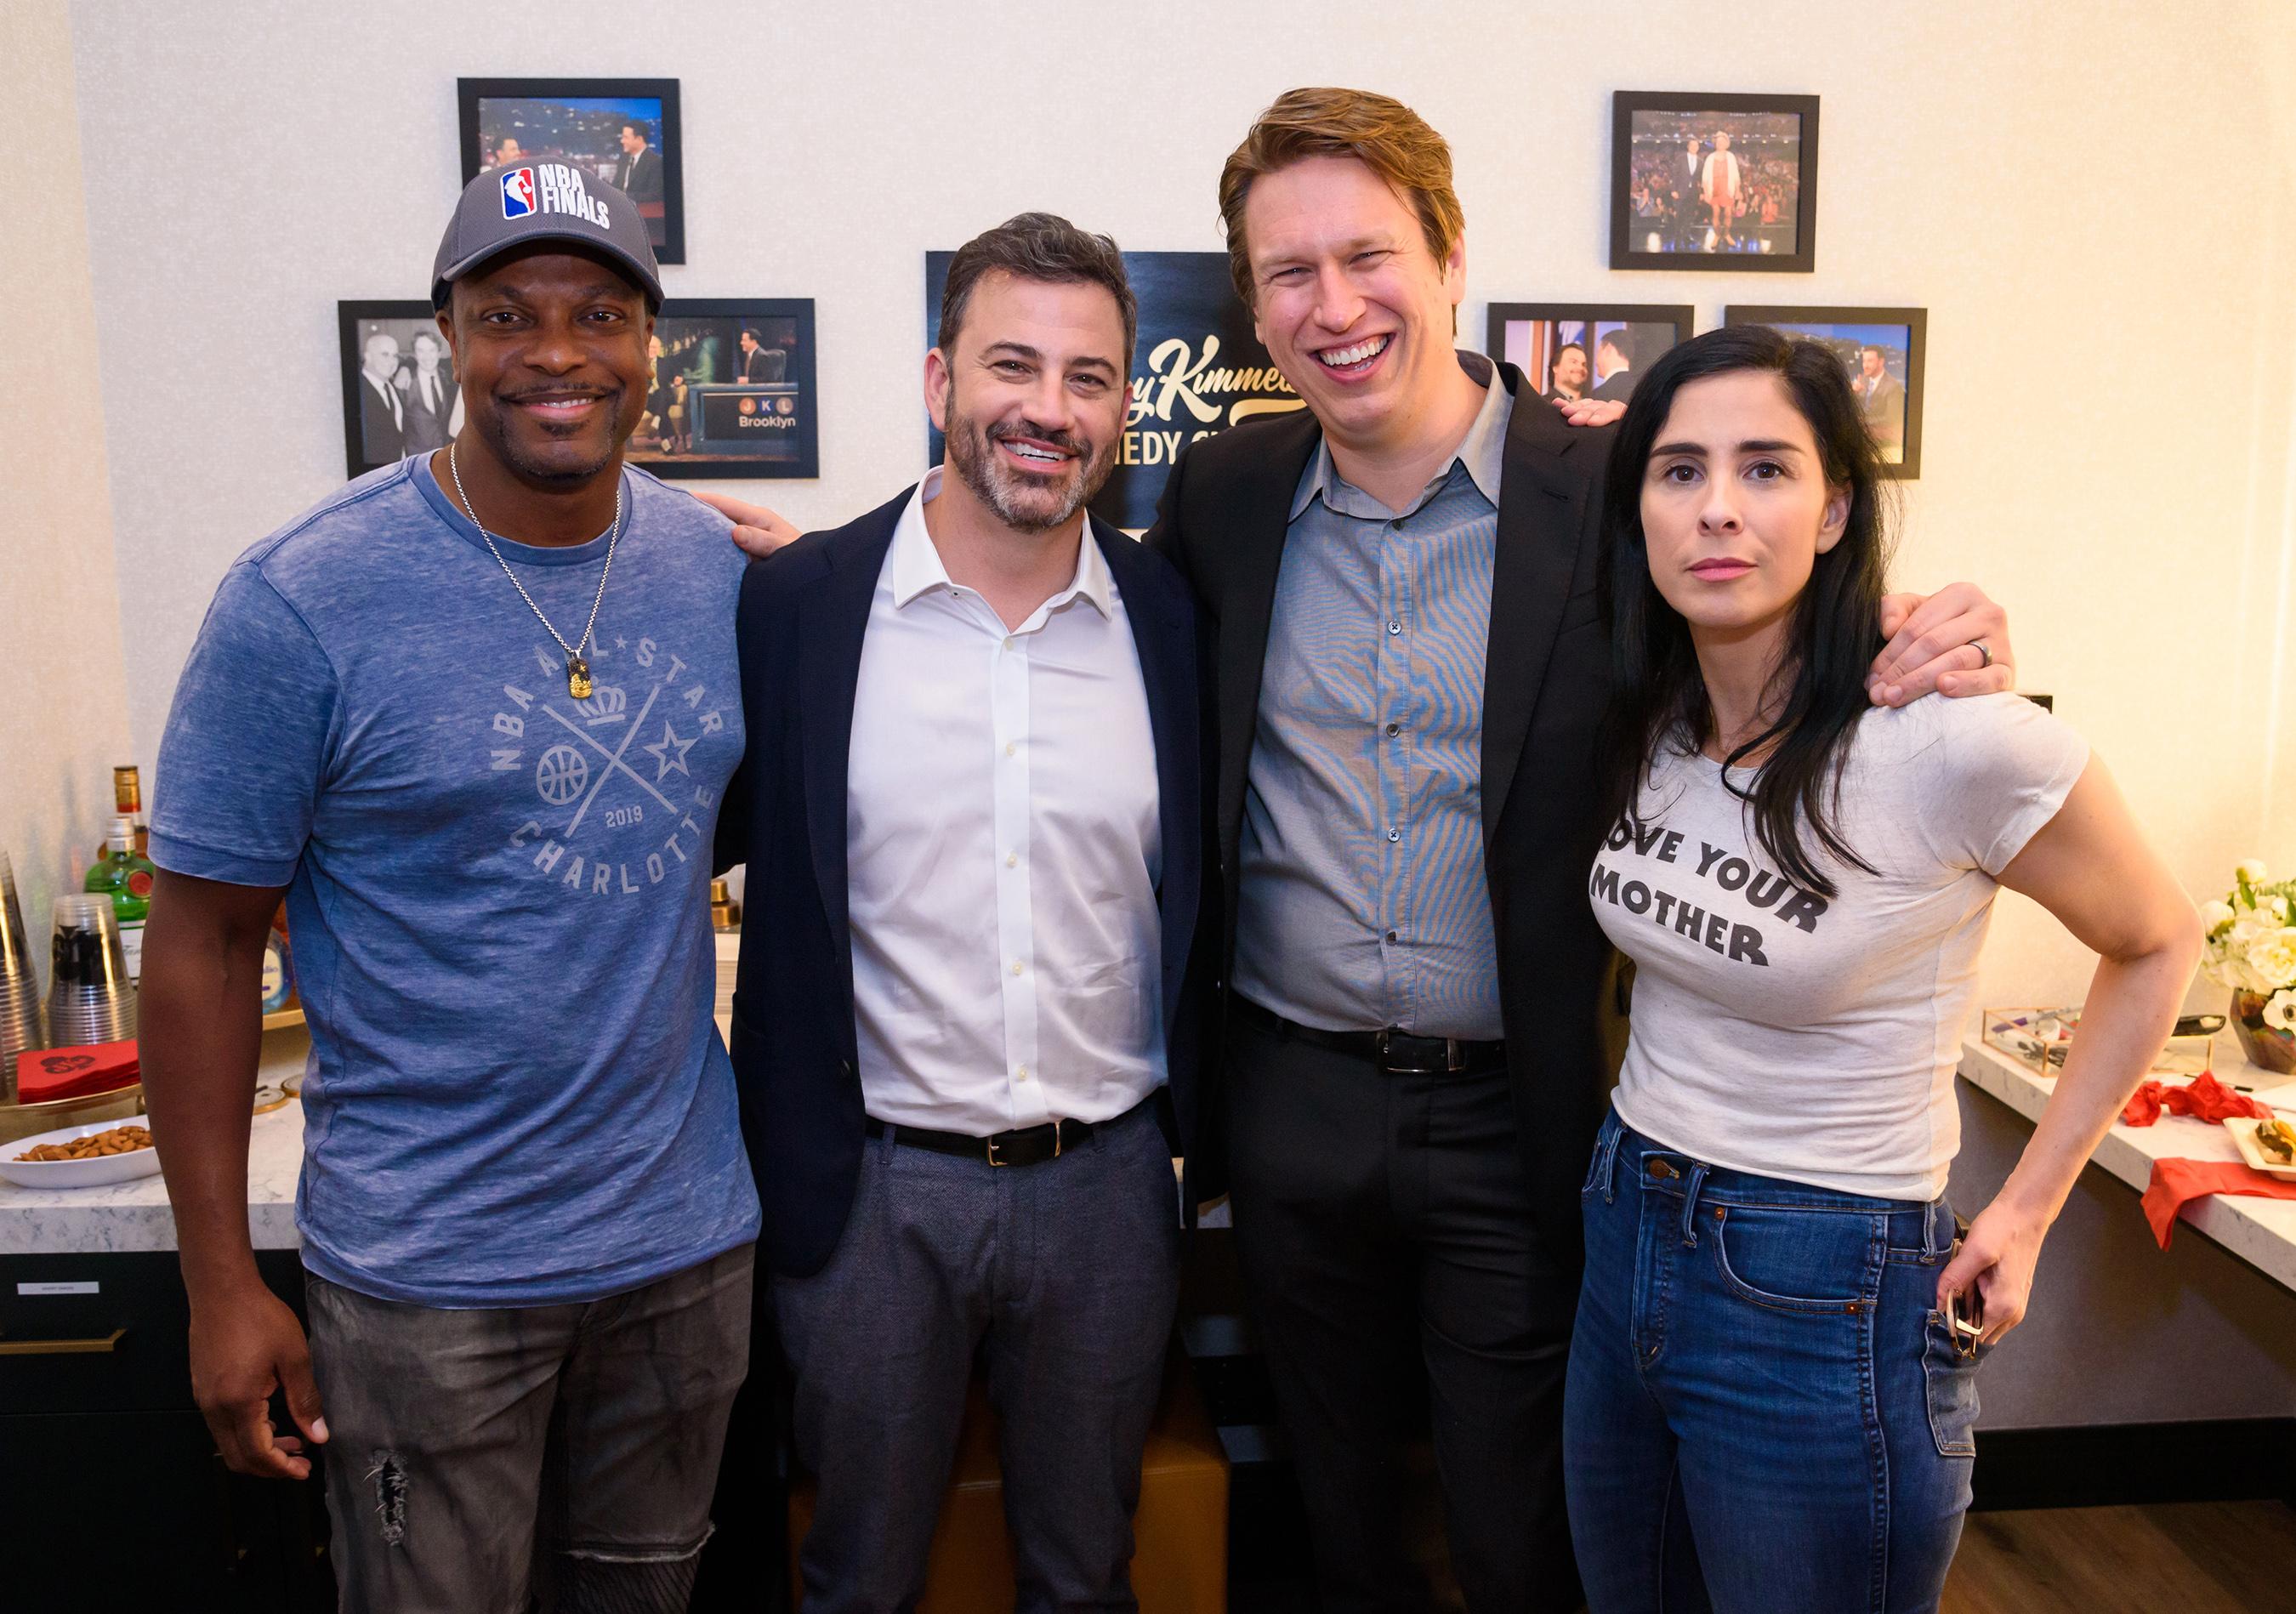 Jimmy Kimmel's Comedy Club Grand Opening - Chris Tucker, Jimmy Kimmel, Pete Holmes, Sarah Silverman (Photo Credit: Kabik Photo Group)